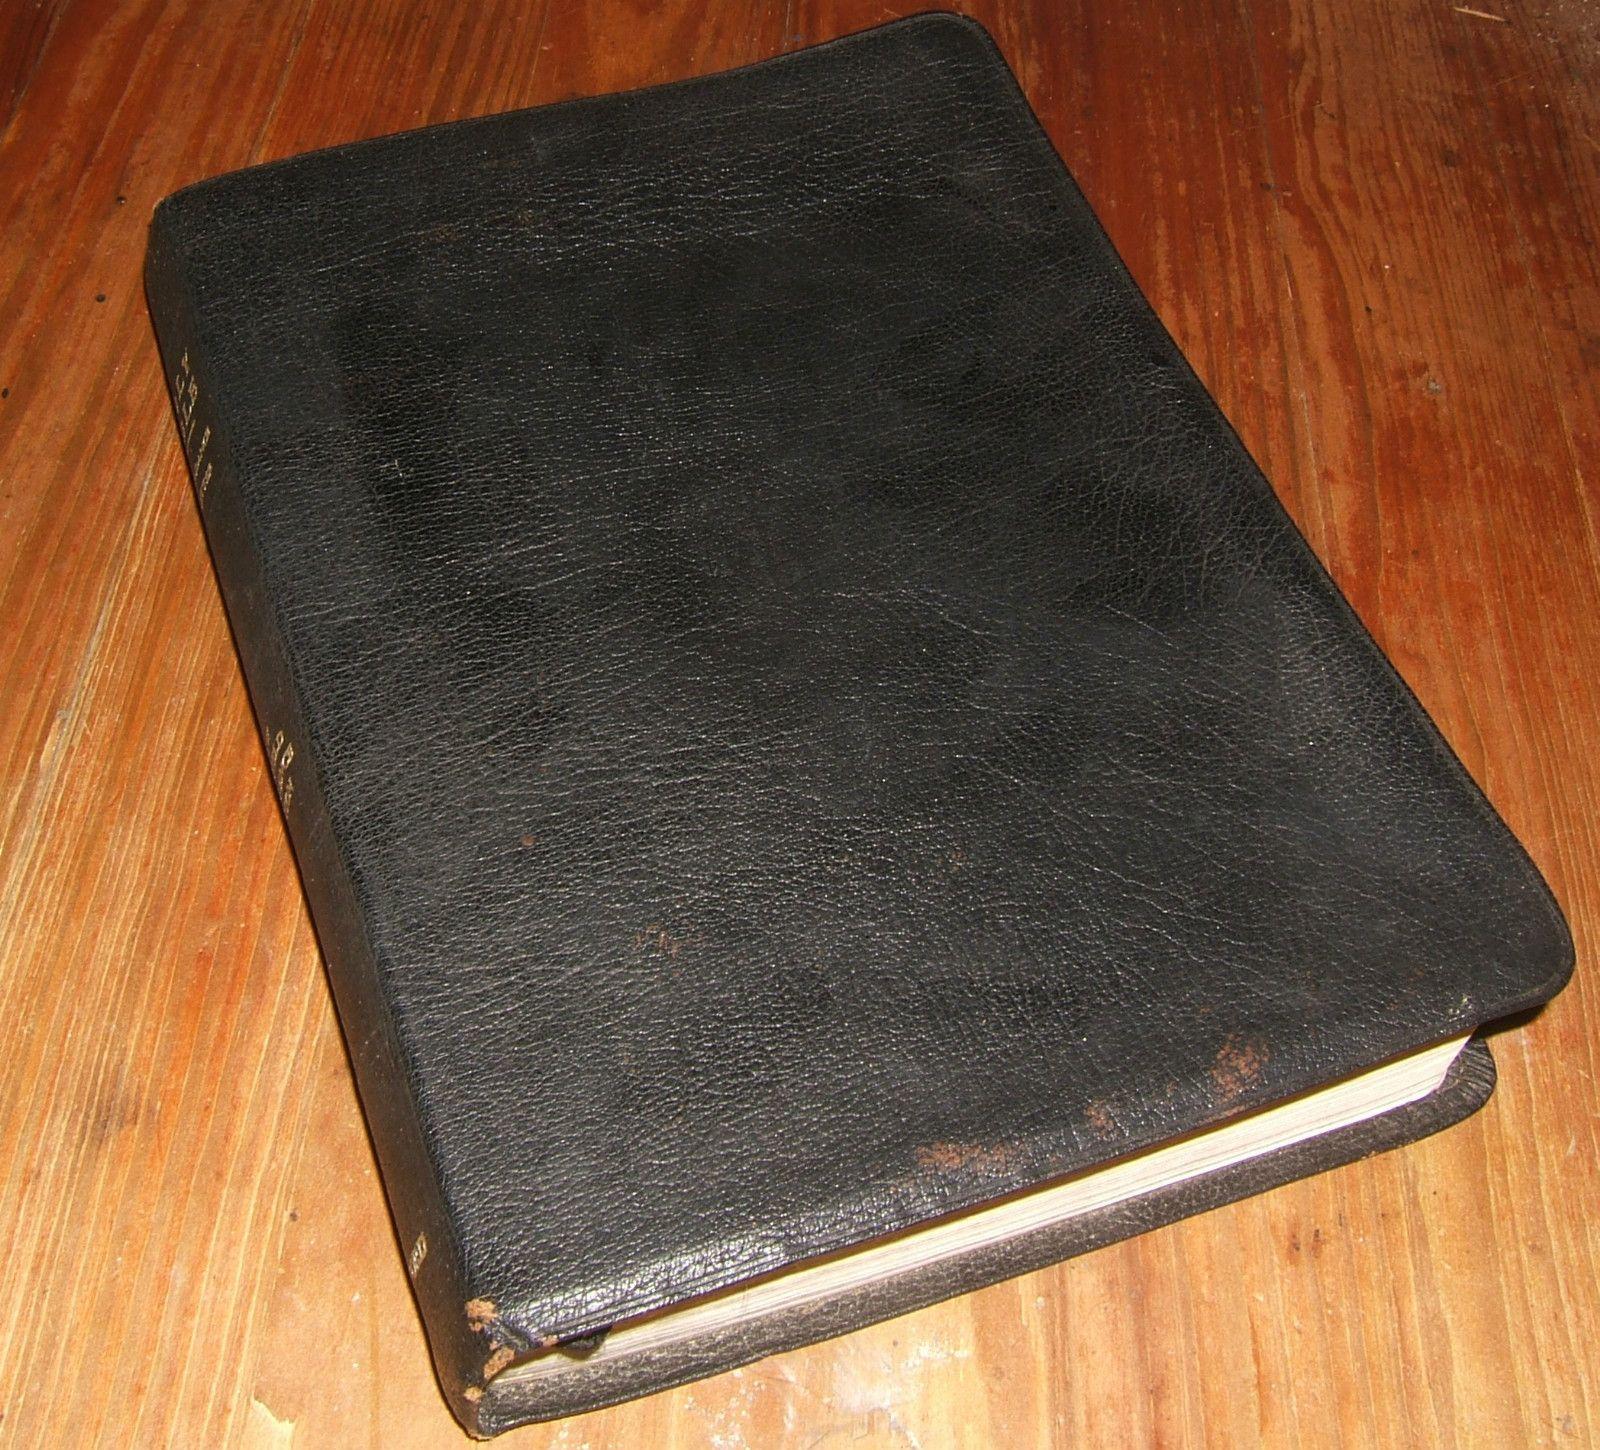 kjv bible pdf red letter